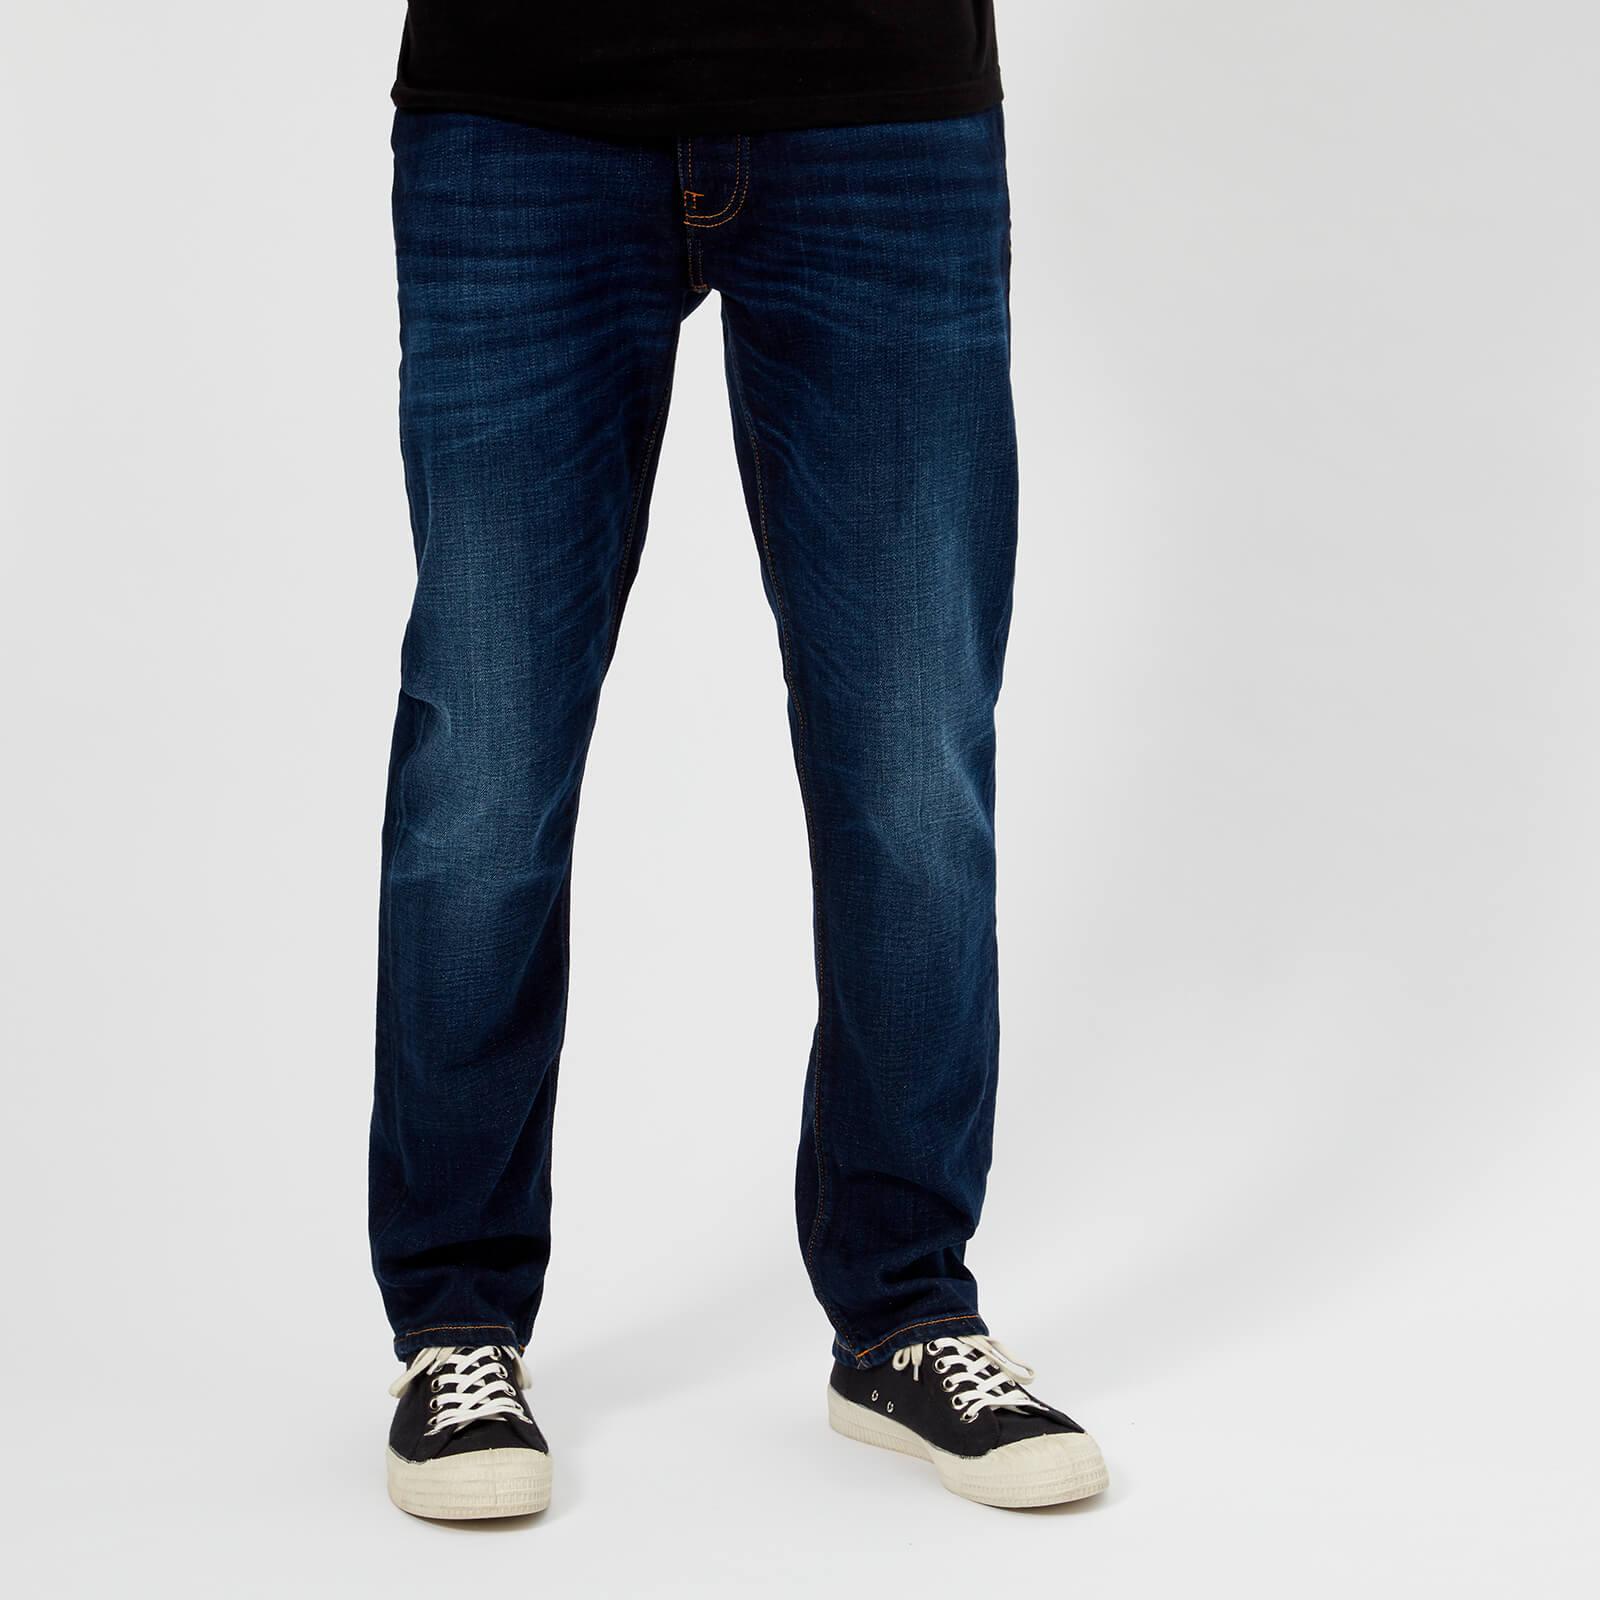 943b673b1c01e Nudie Jeans Men s Dude Dan Straight Jeans - Dark Deep Worn Mens Clothing